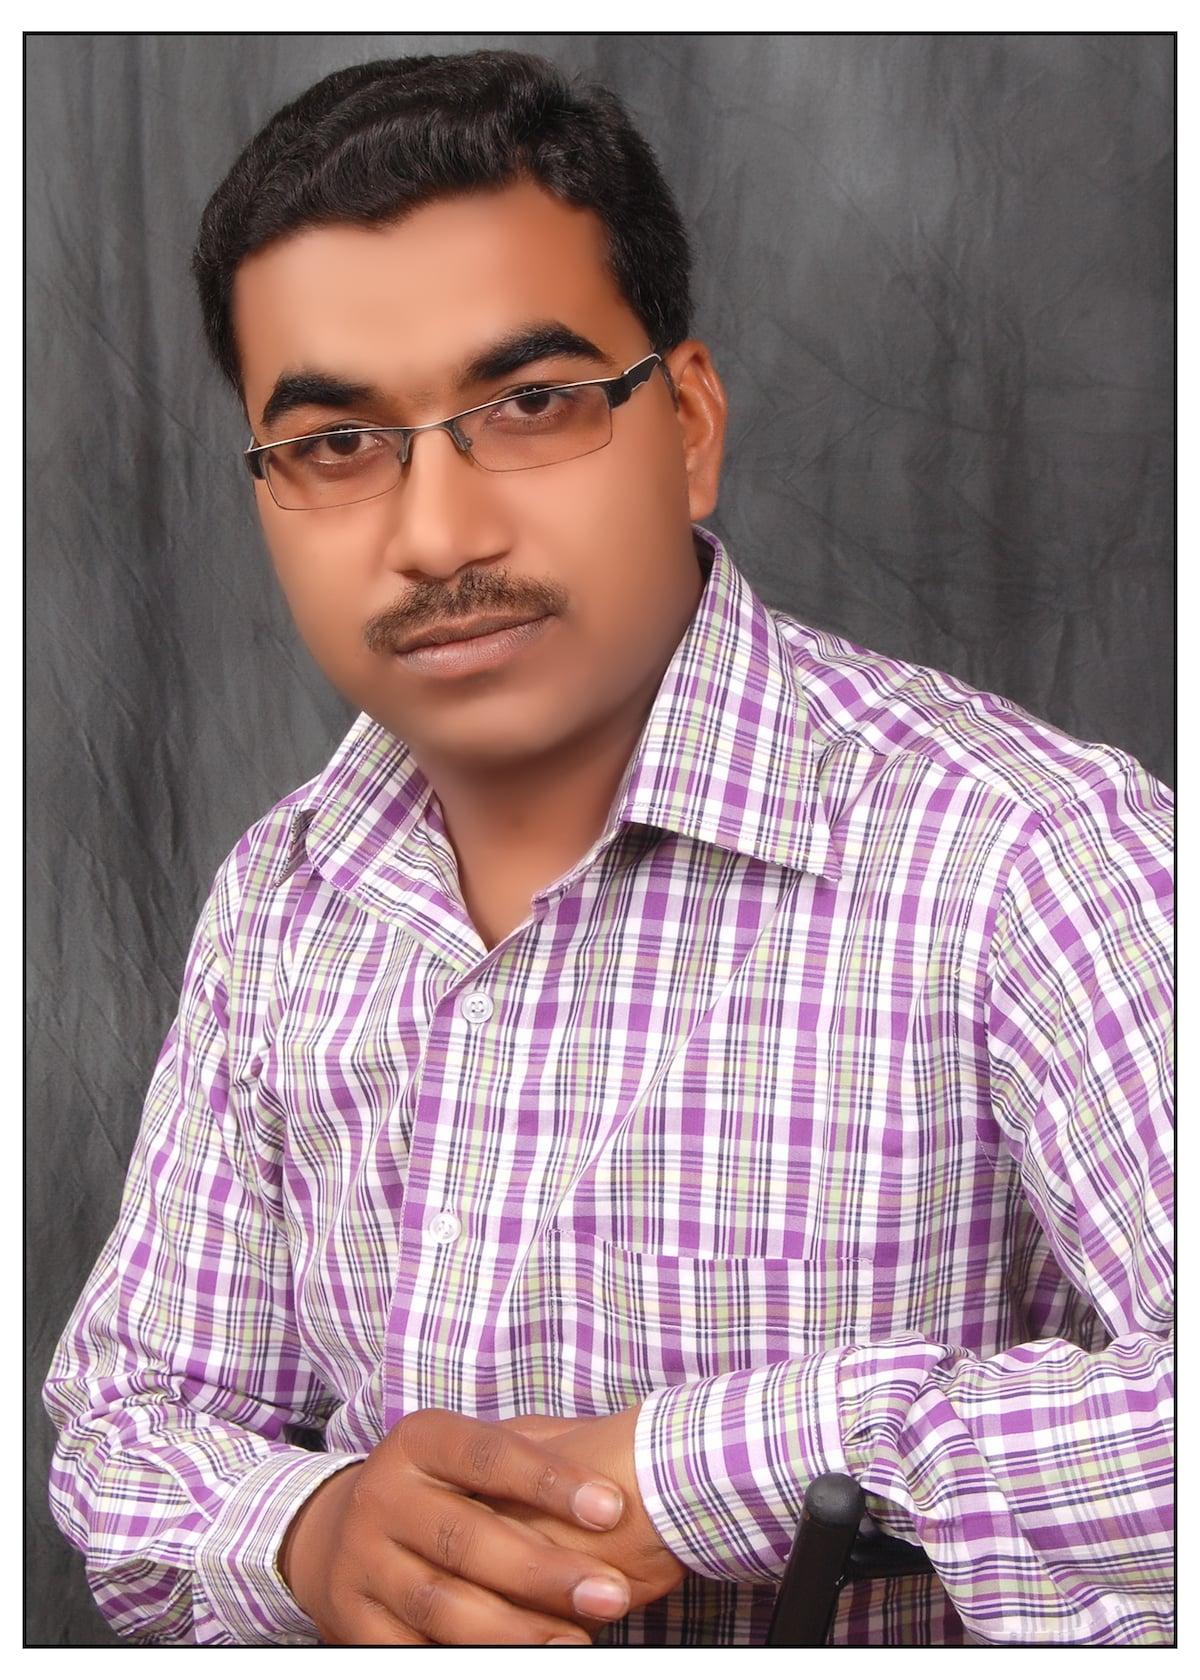 Utkrist From Haridwar, India